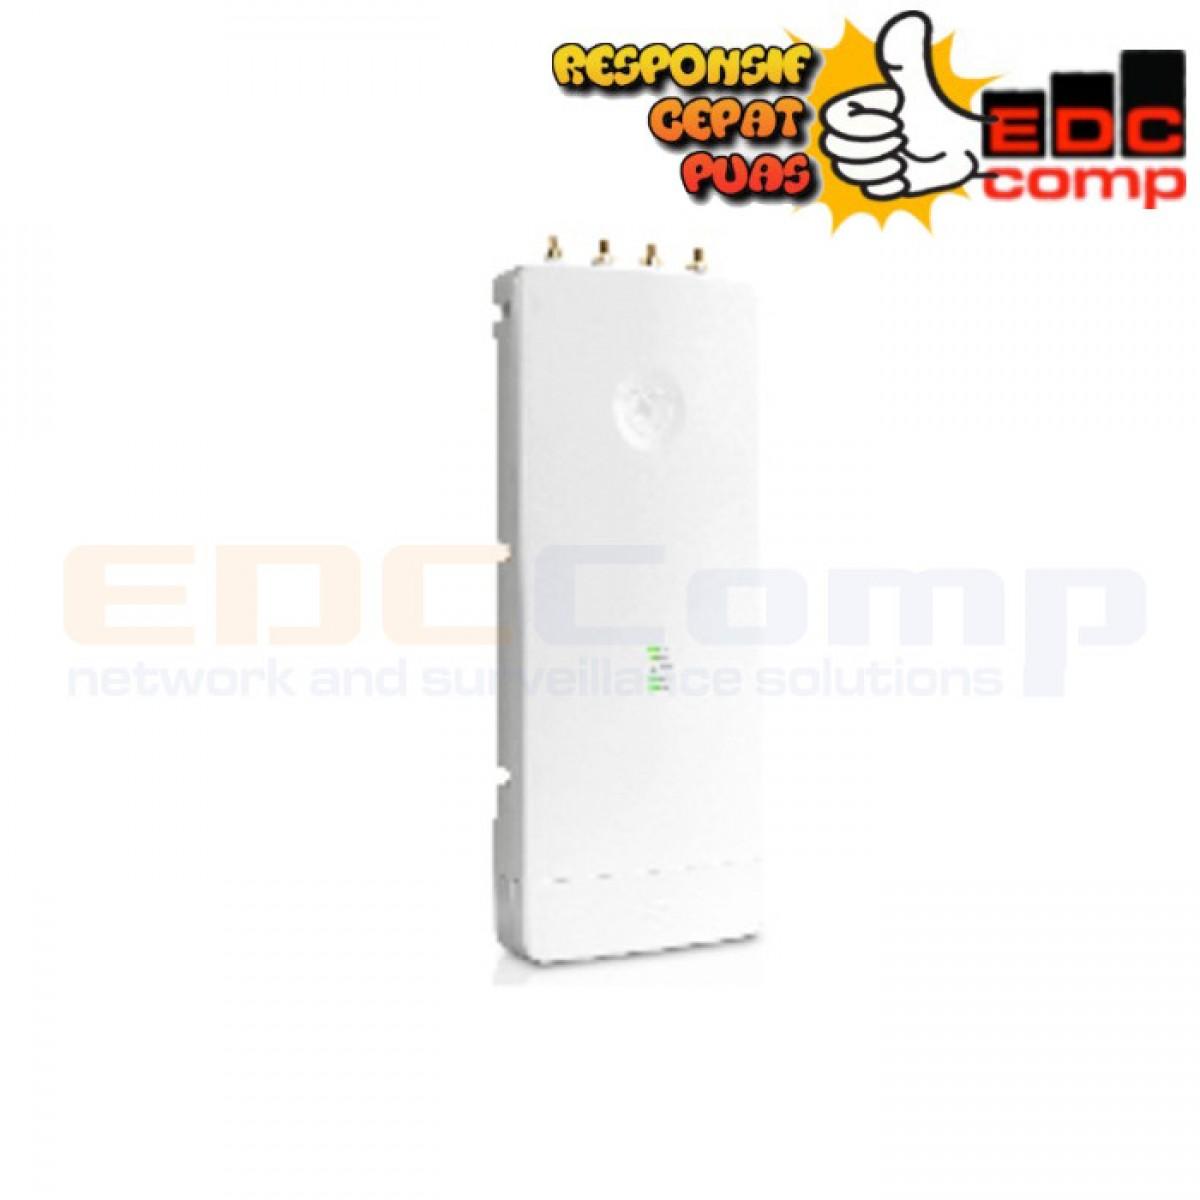 Cambium Networks ePMP3000 Access Point - EdcComp